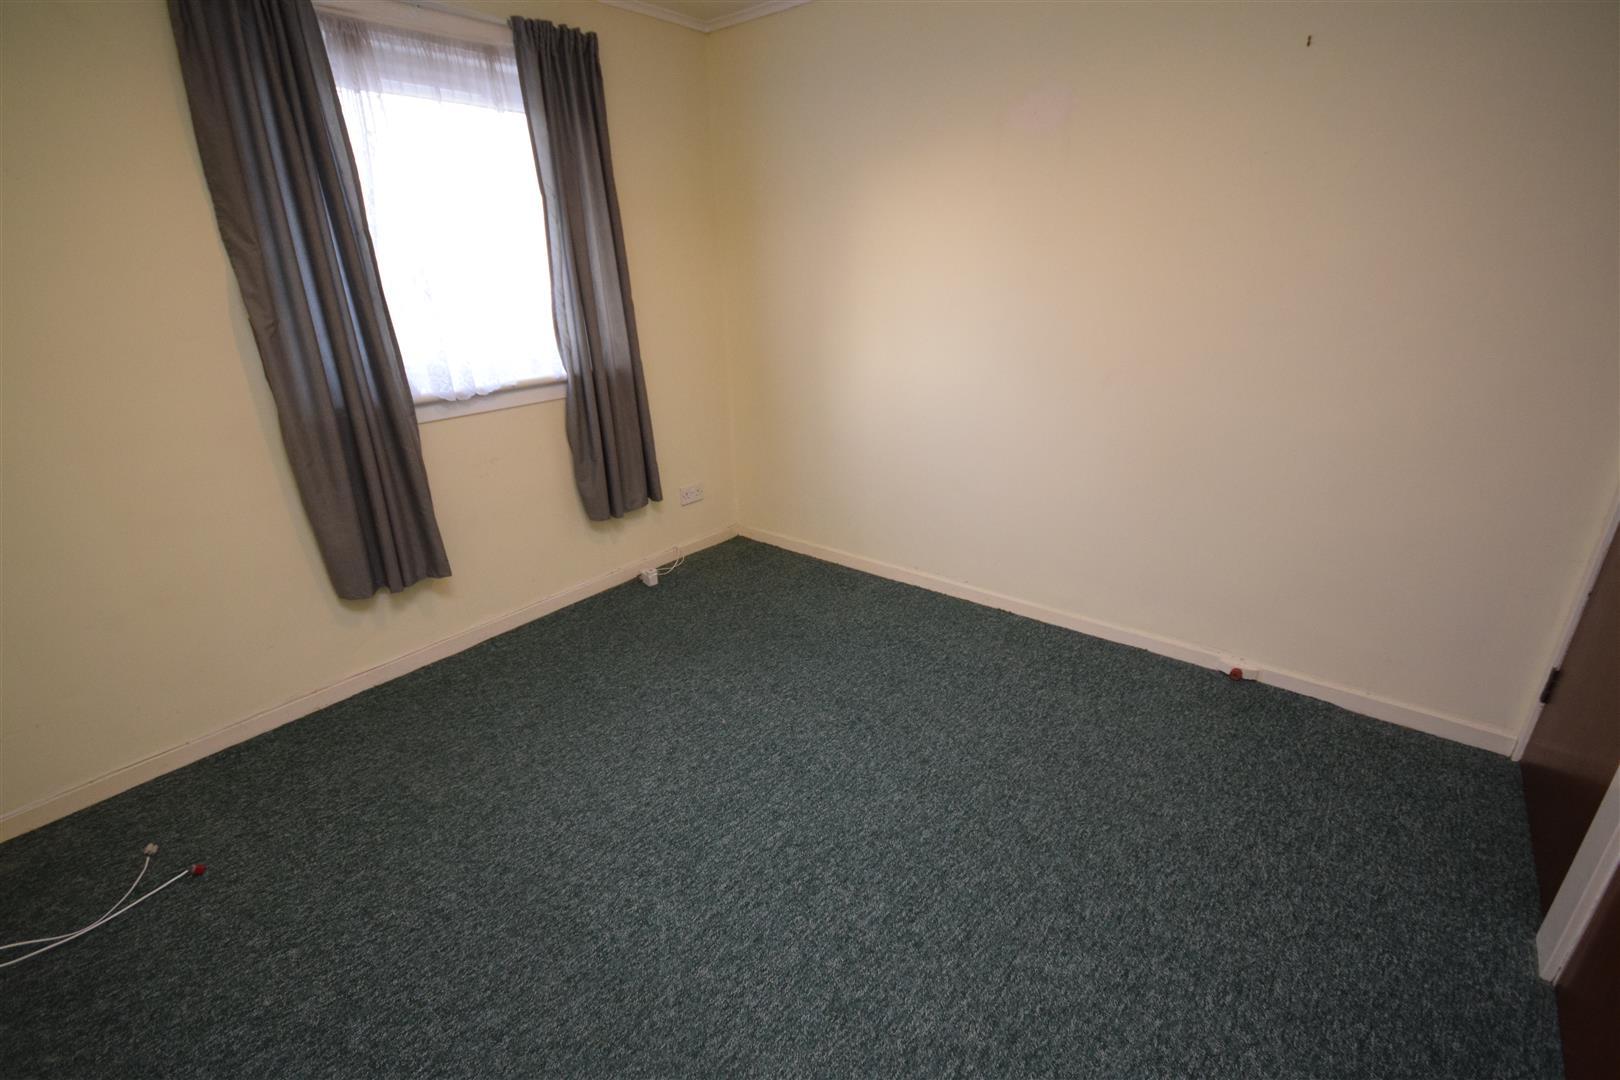 108, Nimmo Place, Perth, Perthshire, PH1 2QA, UK